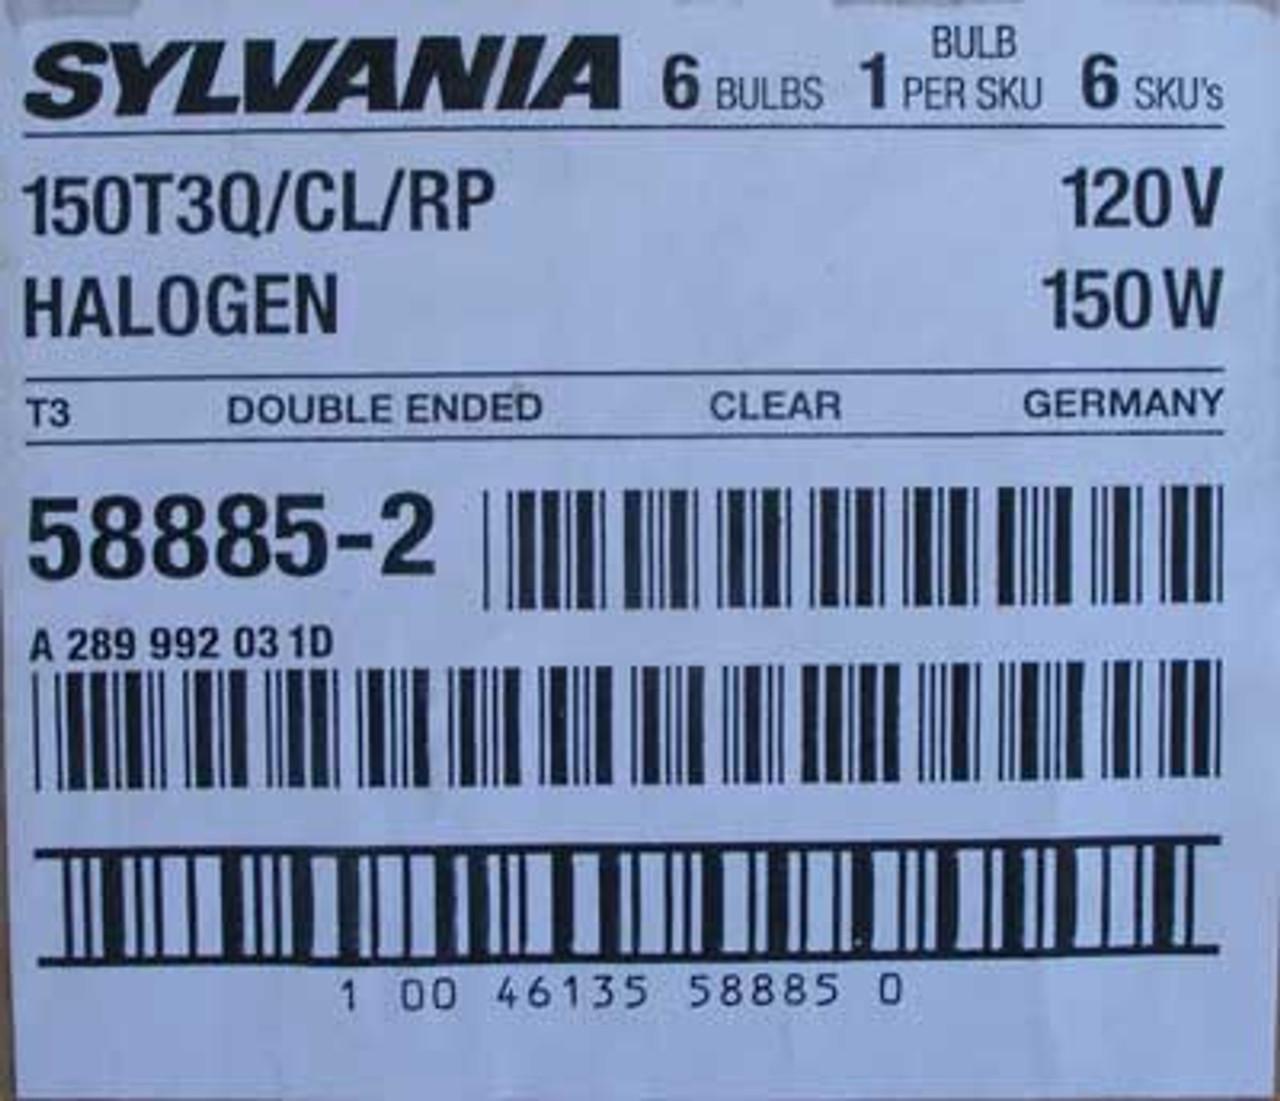 Sylvania 150T3Q/CL/RP 150W 120V Dbl Ended Halogen Light Bulb -Lot of 6 - New